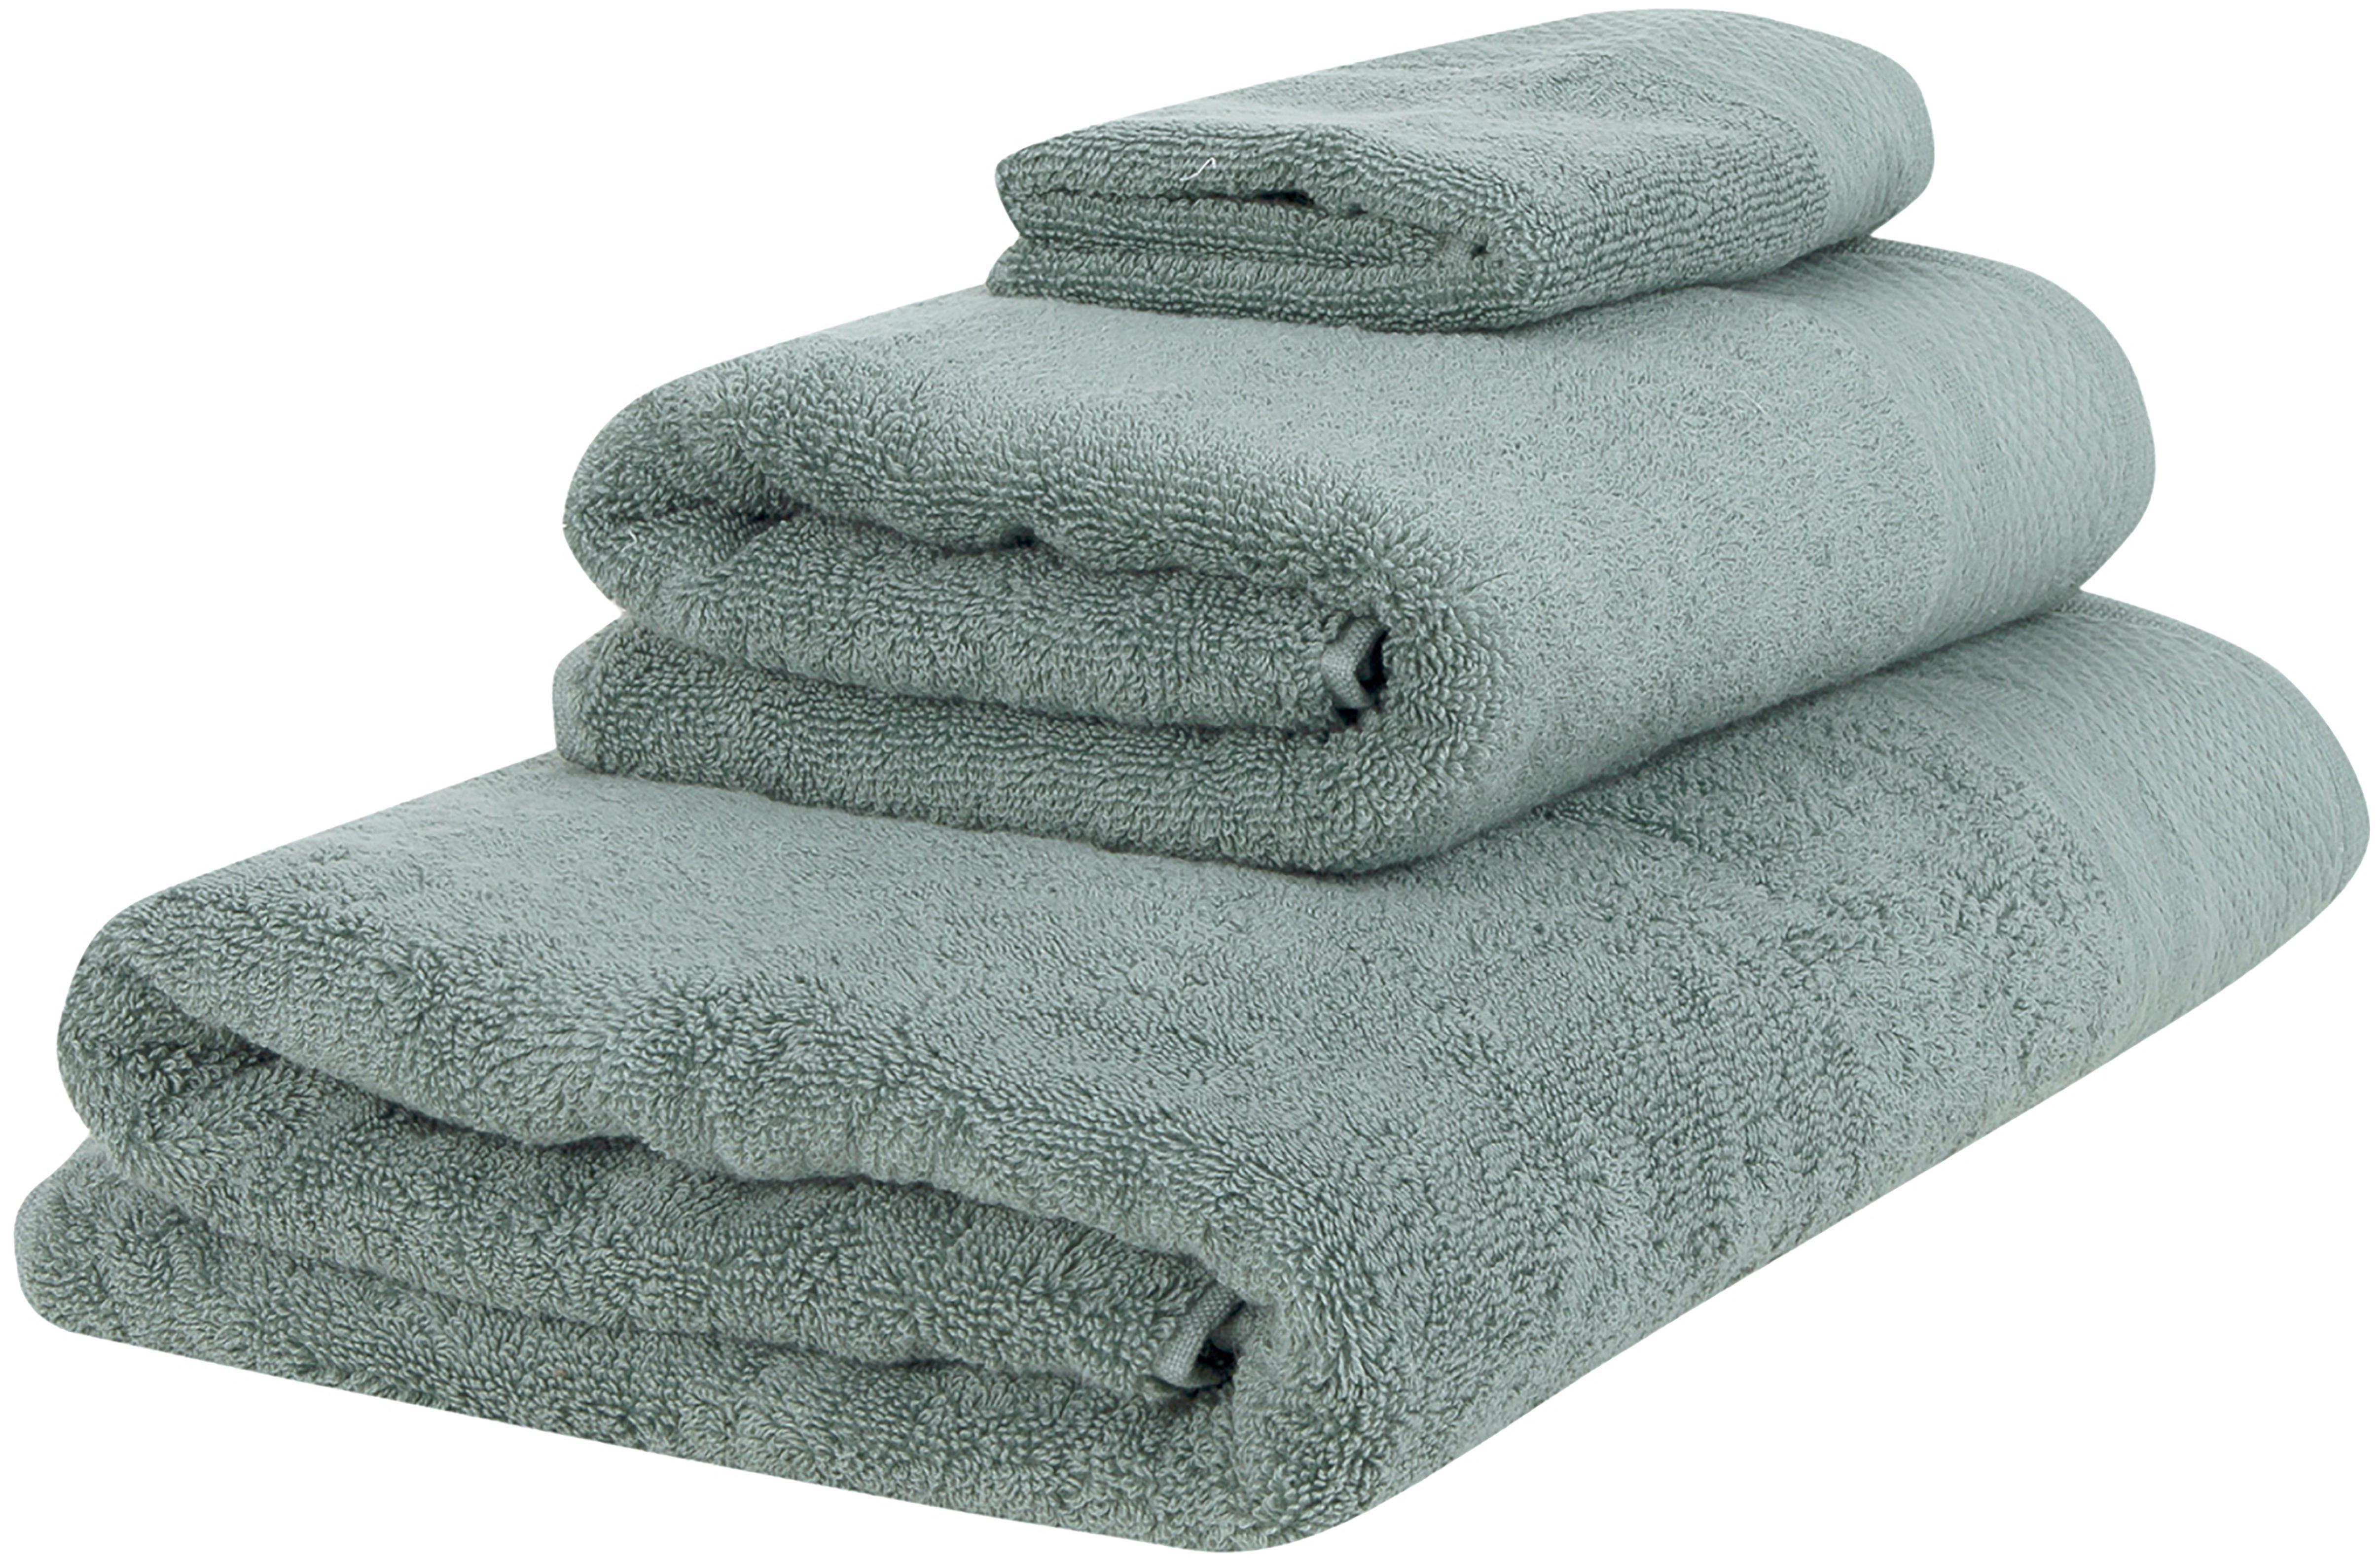 Set de toallas Premium, 3pzas., 100%algodón Gramaje superior 600g/m², Verde salvia, Set de diferentes tamaños